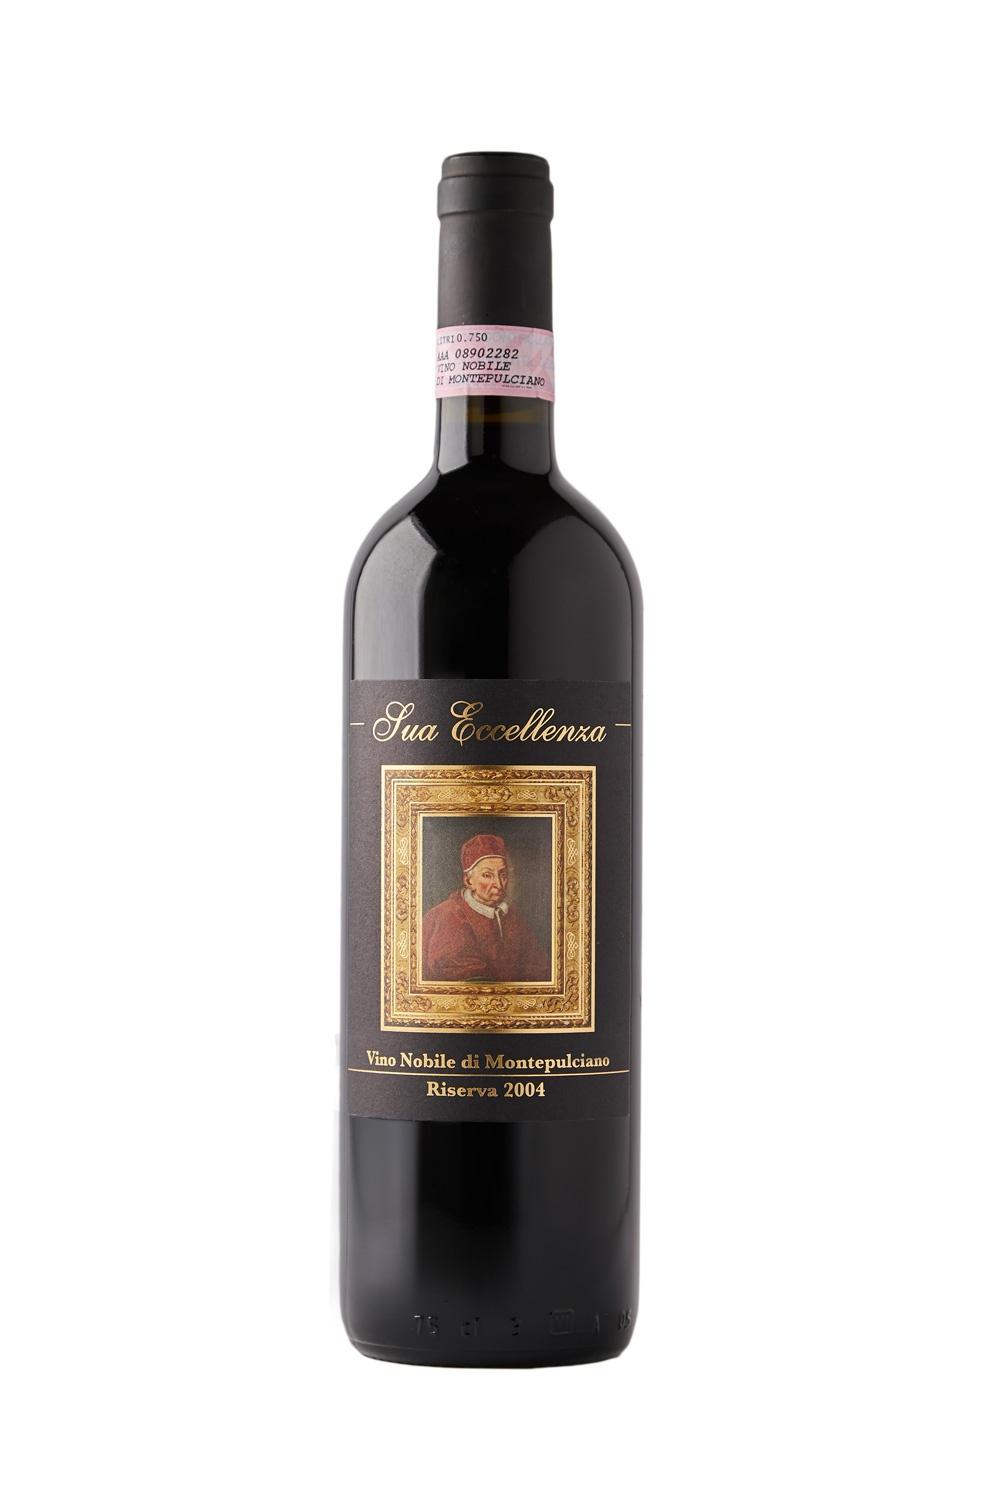 Magnum vino Nobile di Montepulciano docg riserva Ercolani 2012